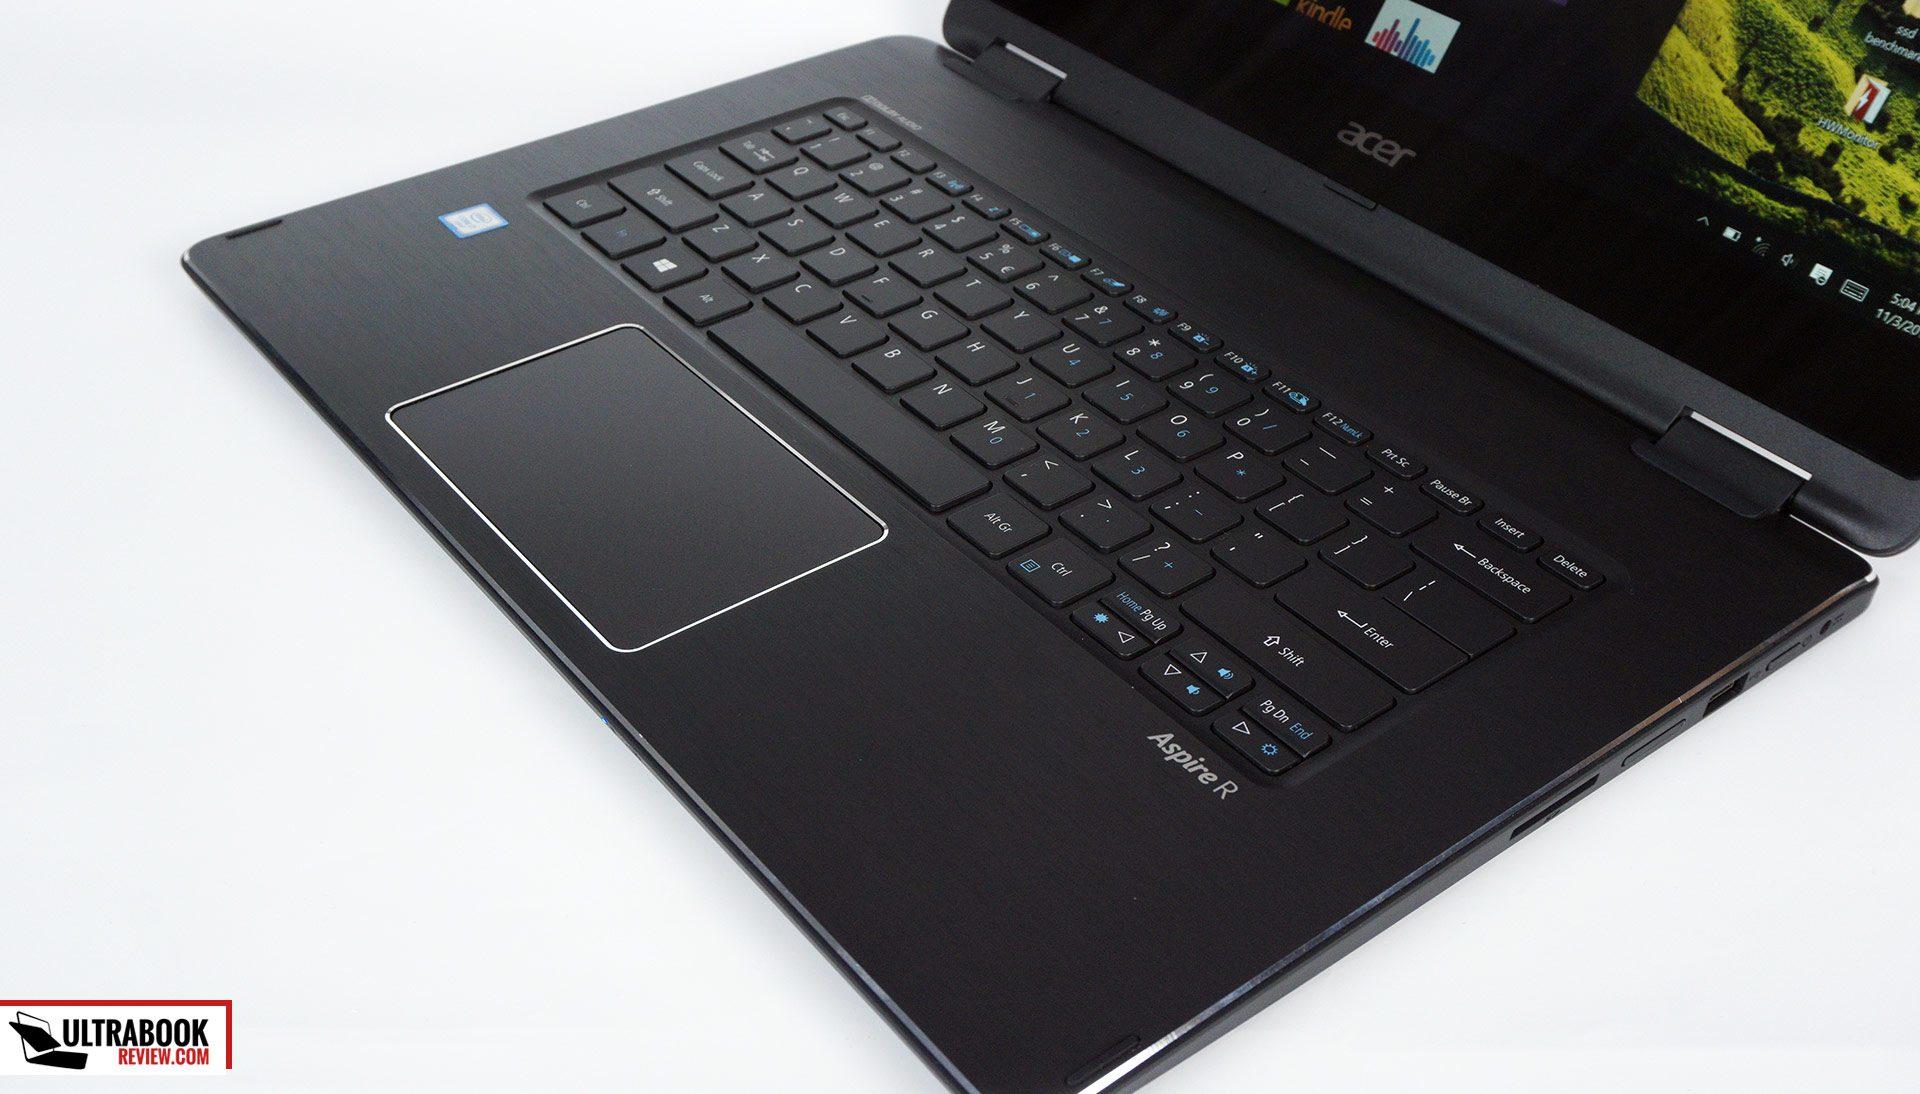 Acer Aspire R14 R5-471T review - a premium 14-incher